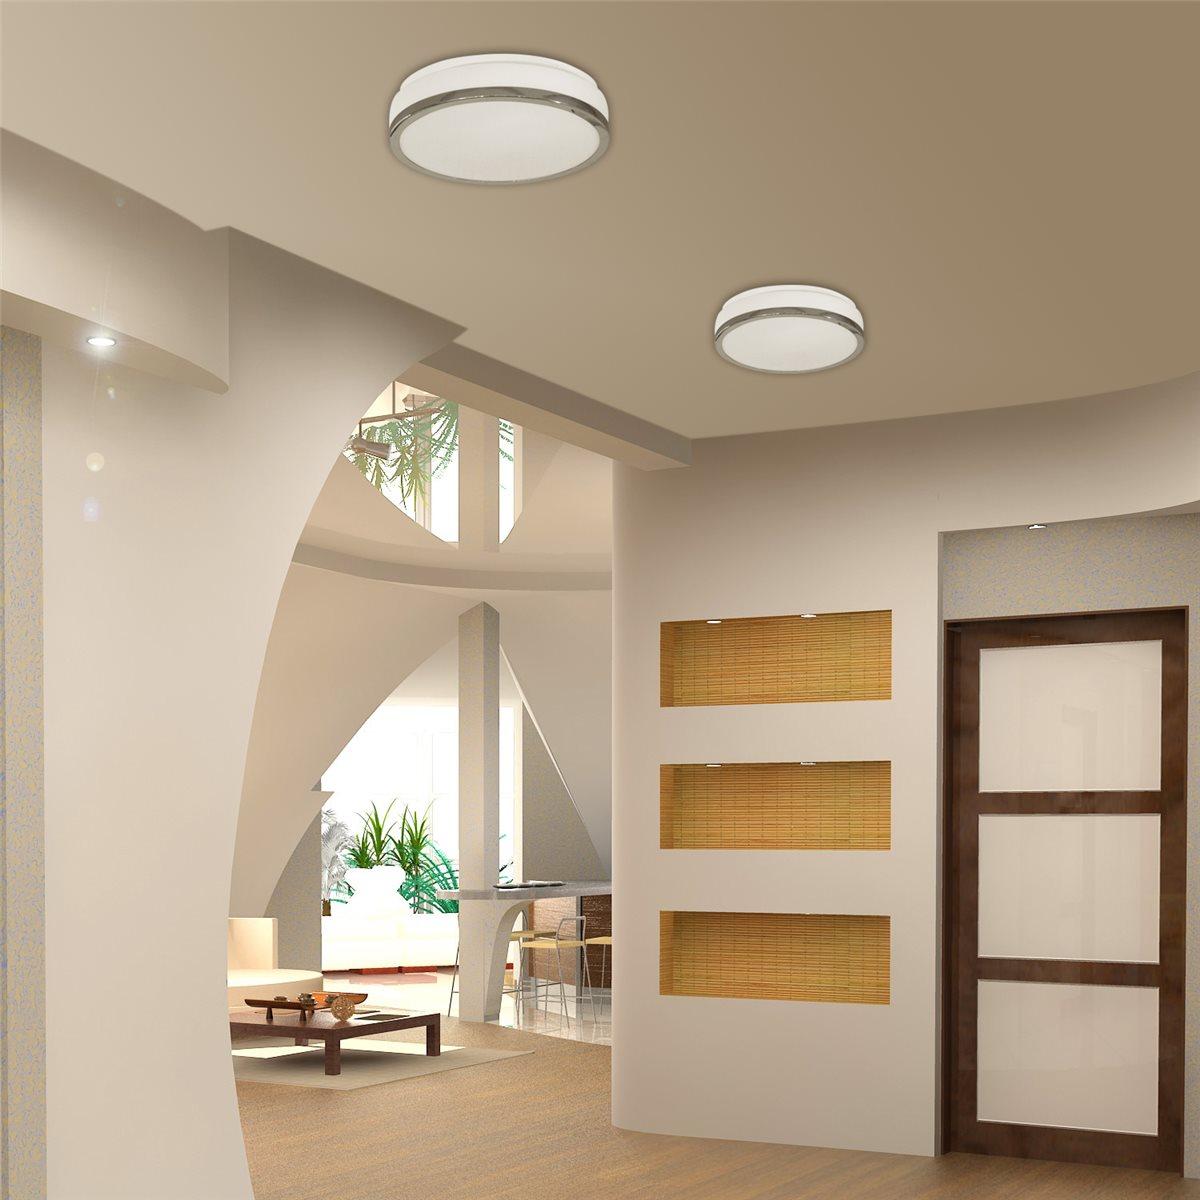 lampenlux aussenleuchte danilo 230v deckenlampe badlampe rund glas terasse 2252 09. Black Bedroom Furniture Sets. Home Design Ideas